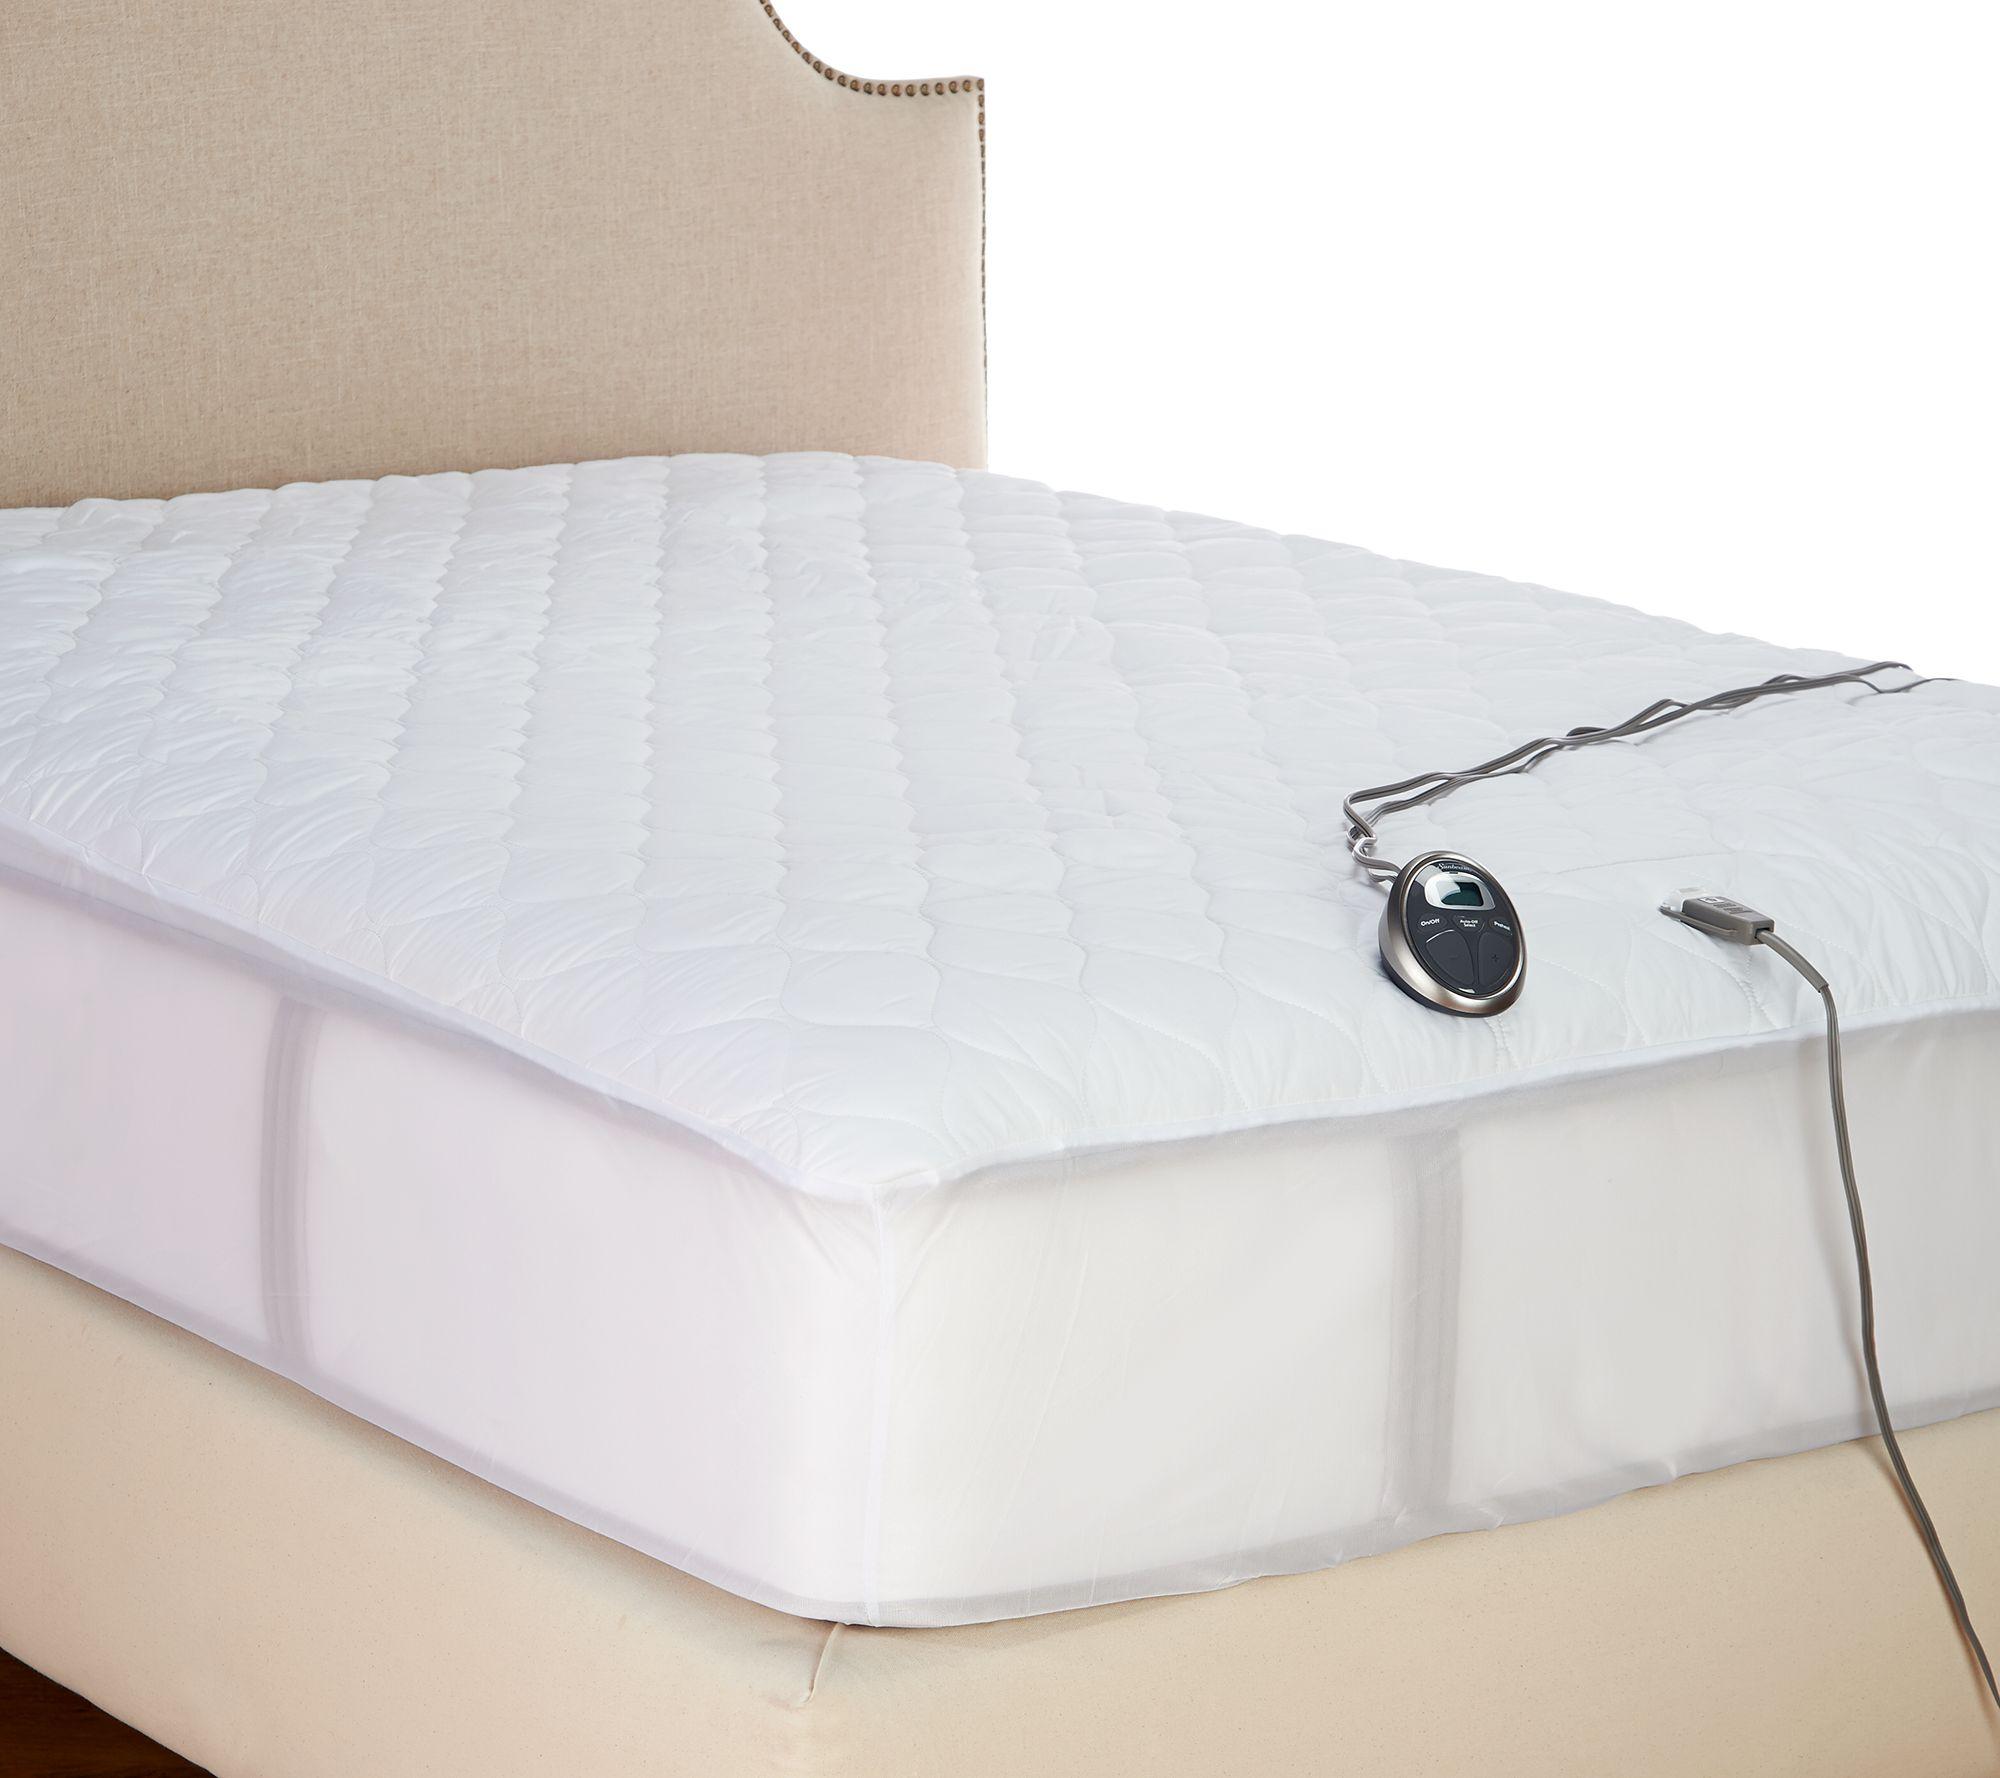 walmart mattress heated com pad sunbeam ip